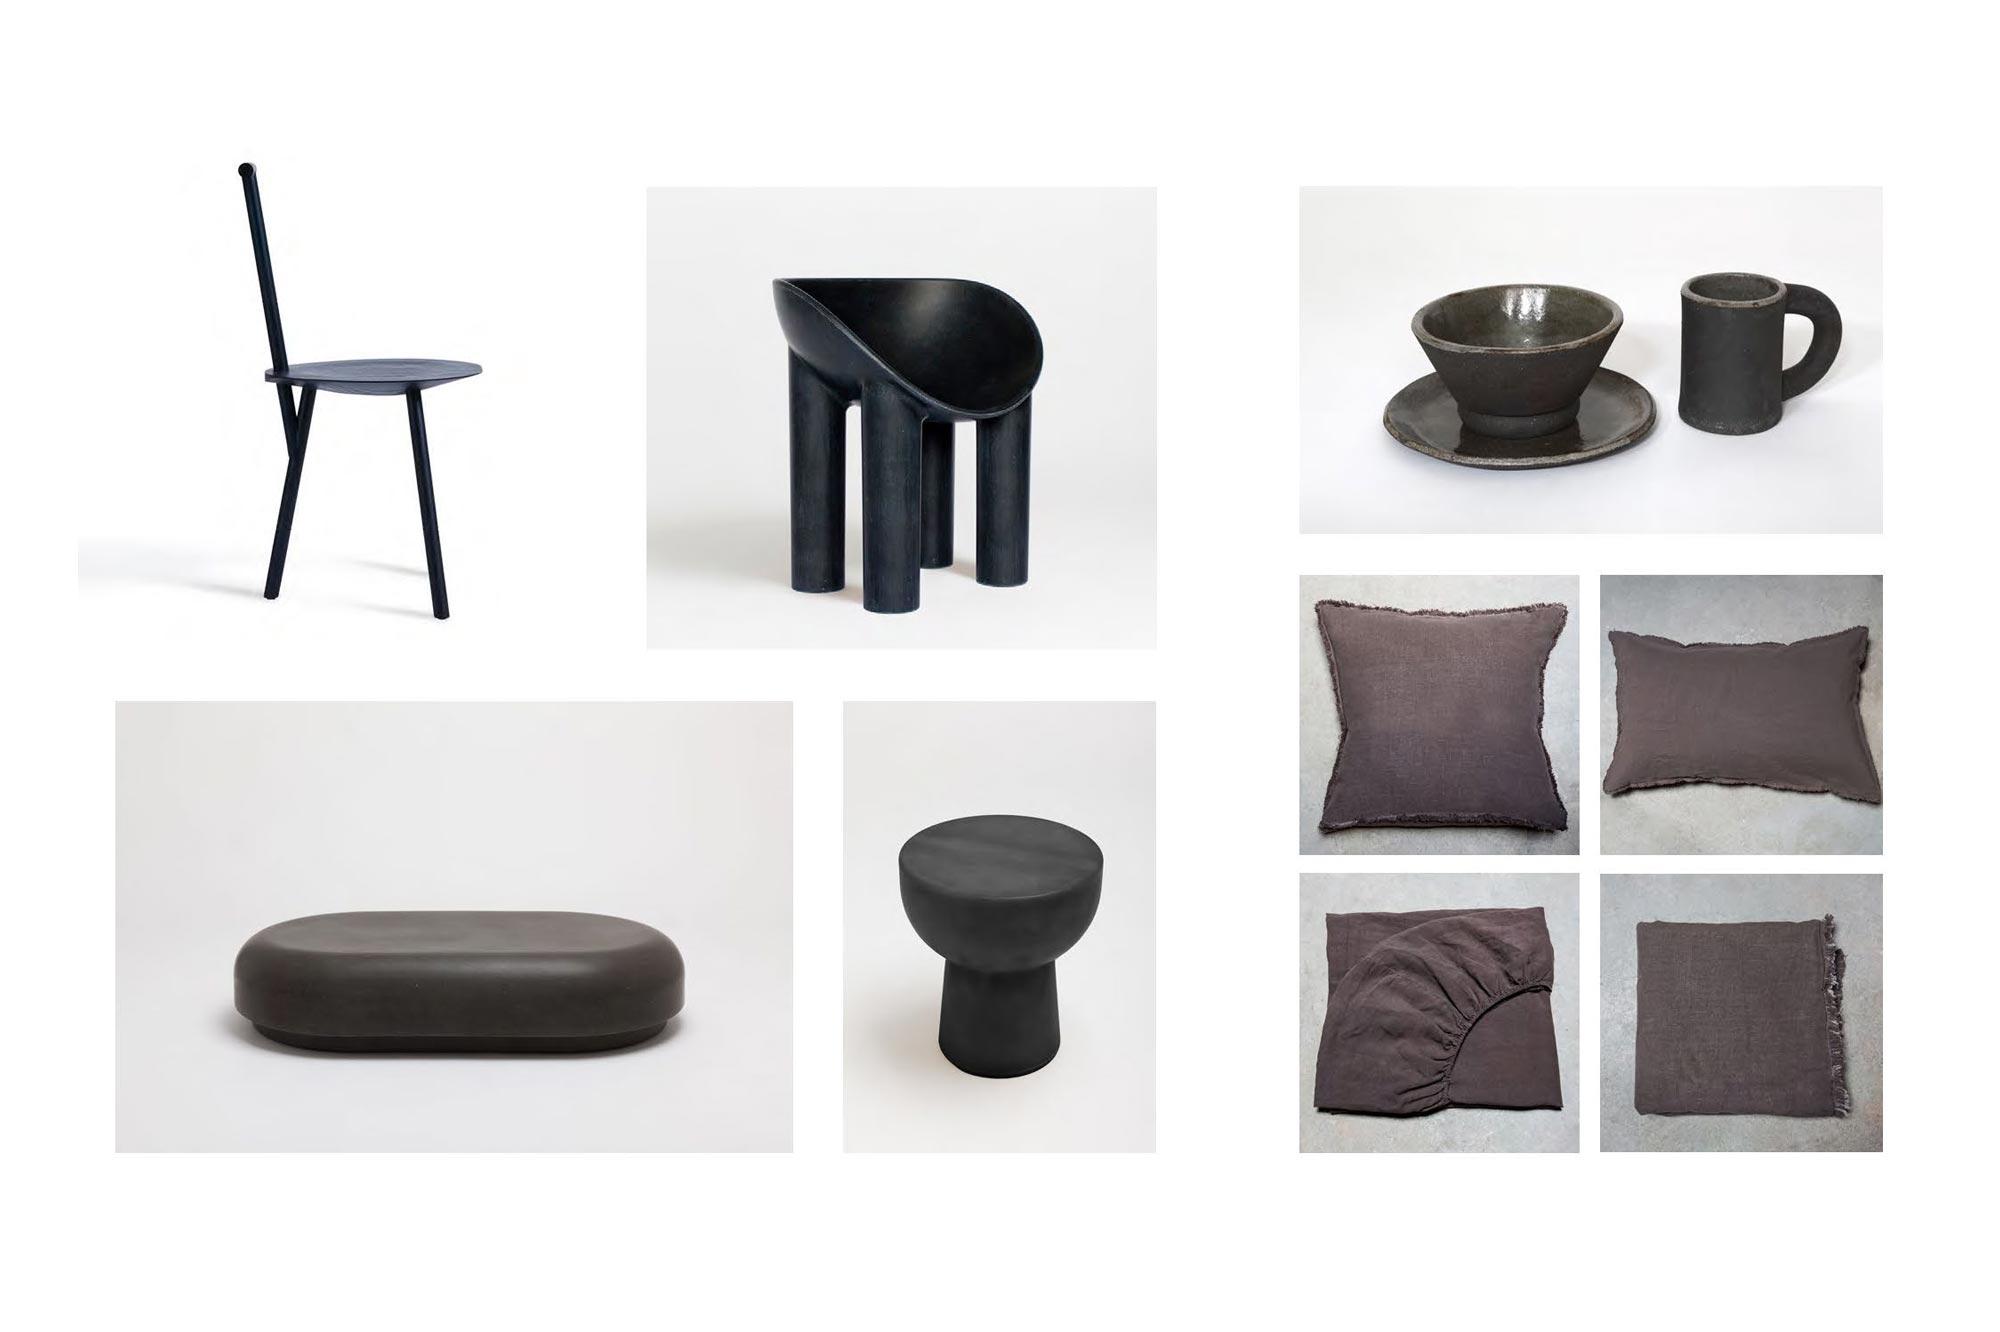 cube-haus-faye-toogood-architects-cs-2000px-09